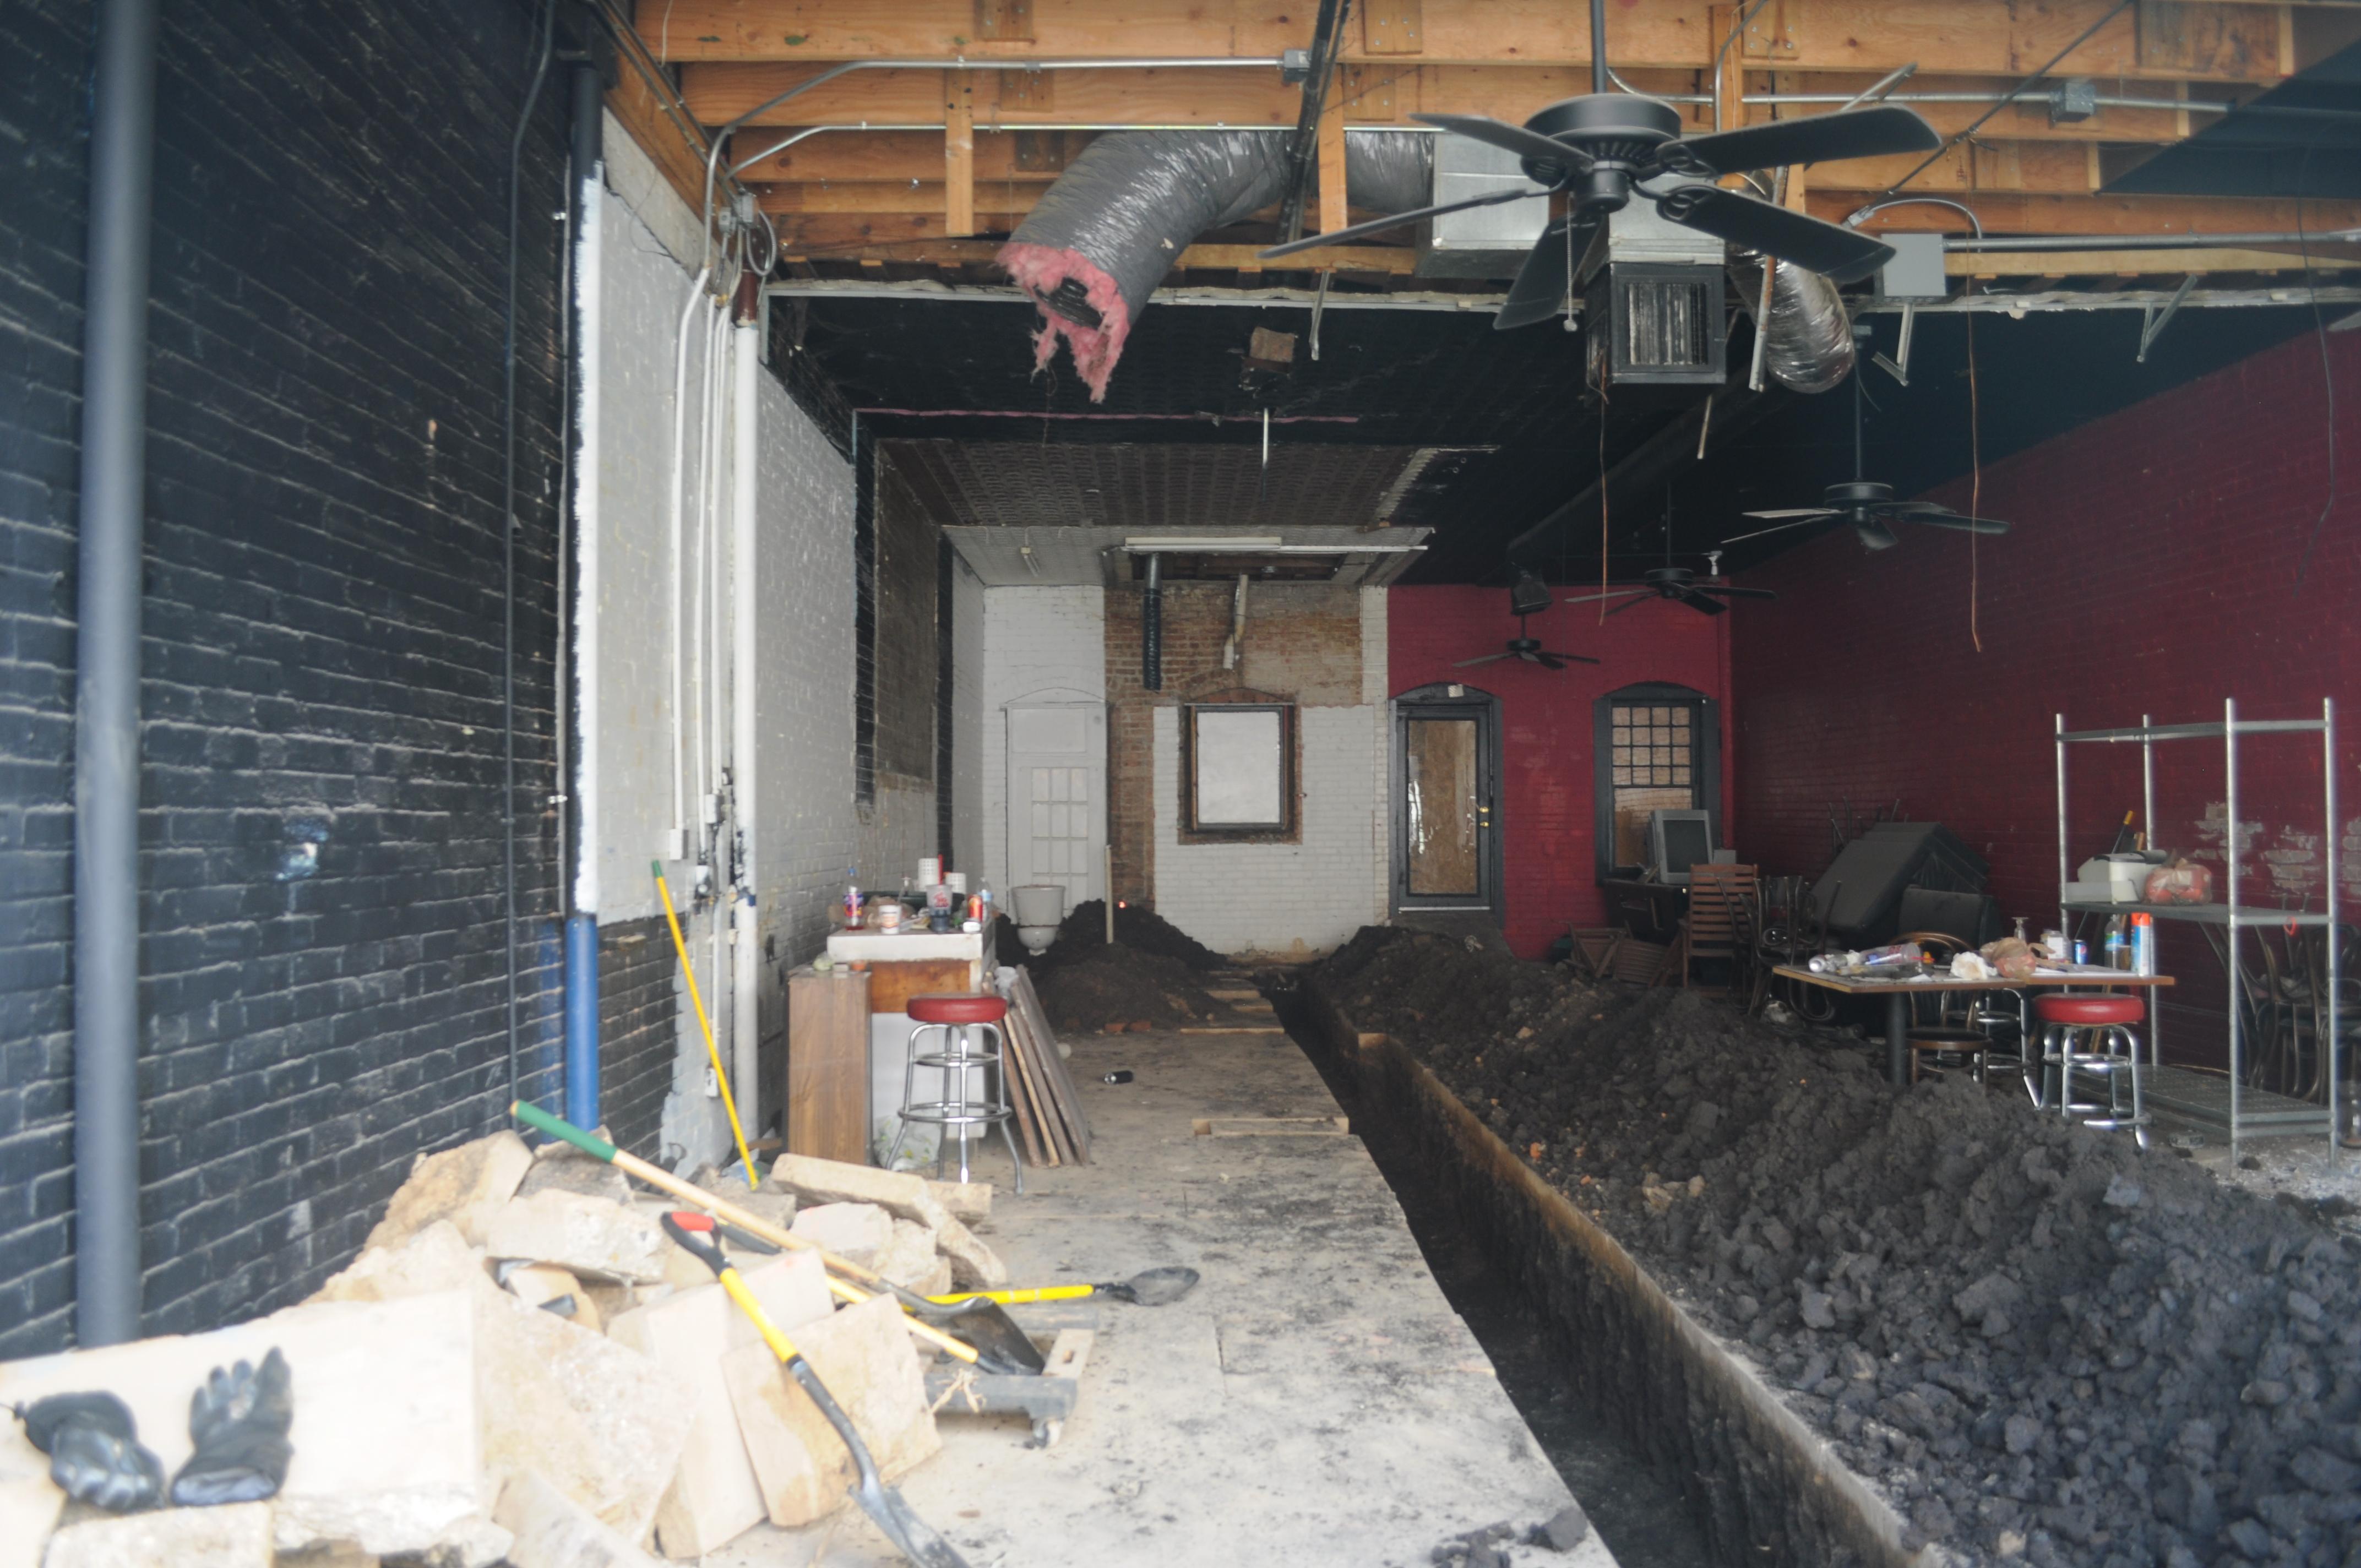 undergoing major renovation.jpg English: Interior of a building on Elm Street, Deep Ellum, Dallas, Texas, U.S.A. undergoing major renovation. Date 3 February